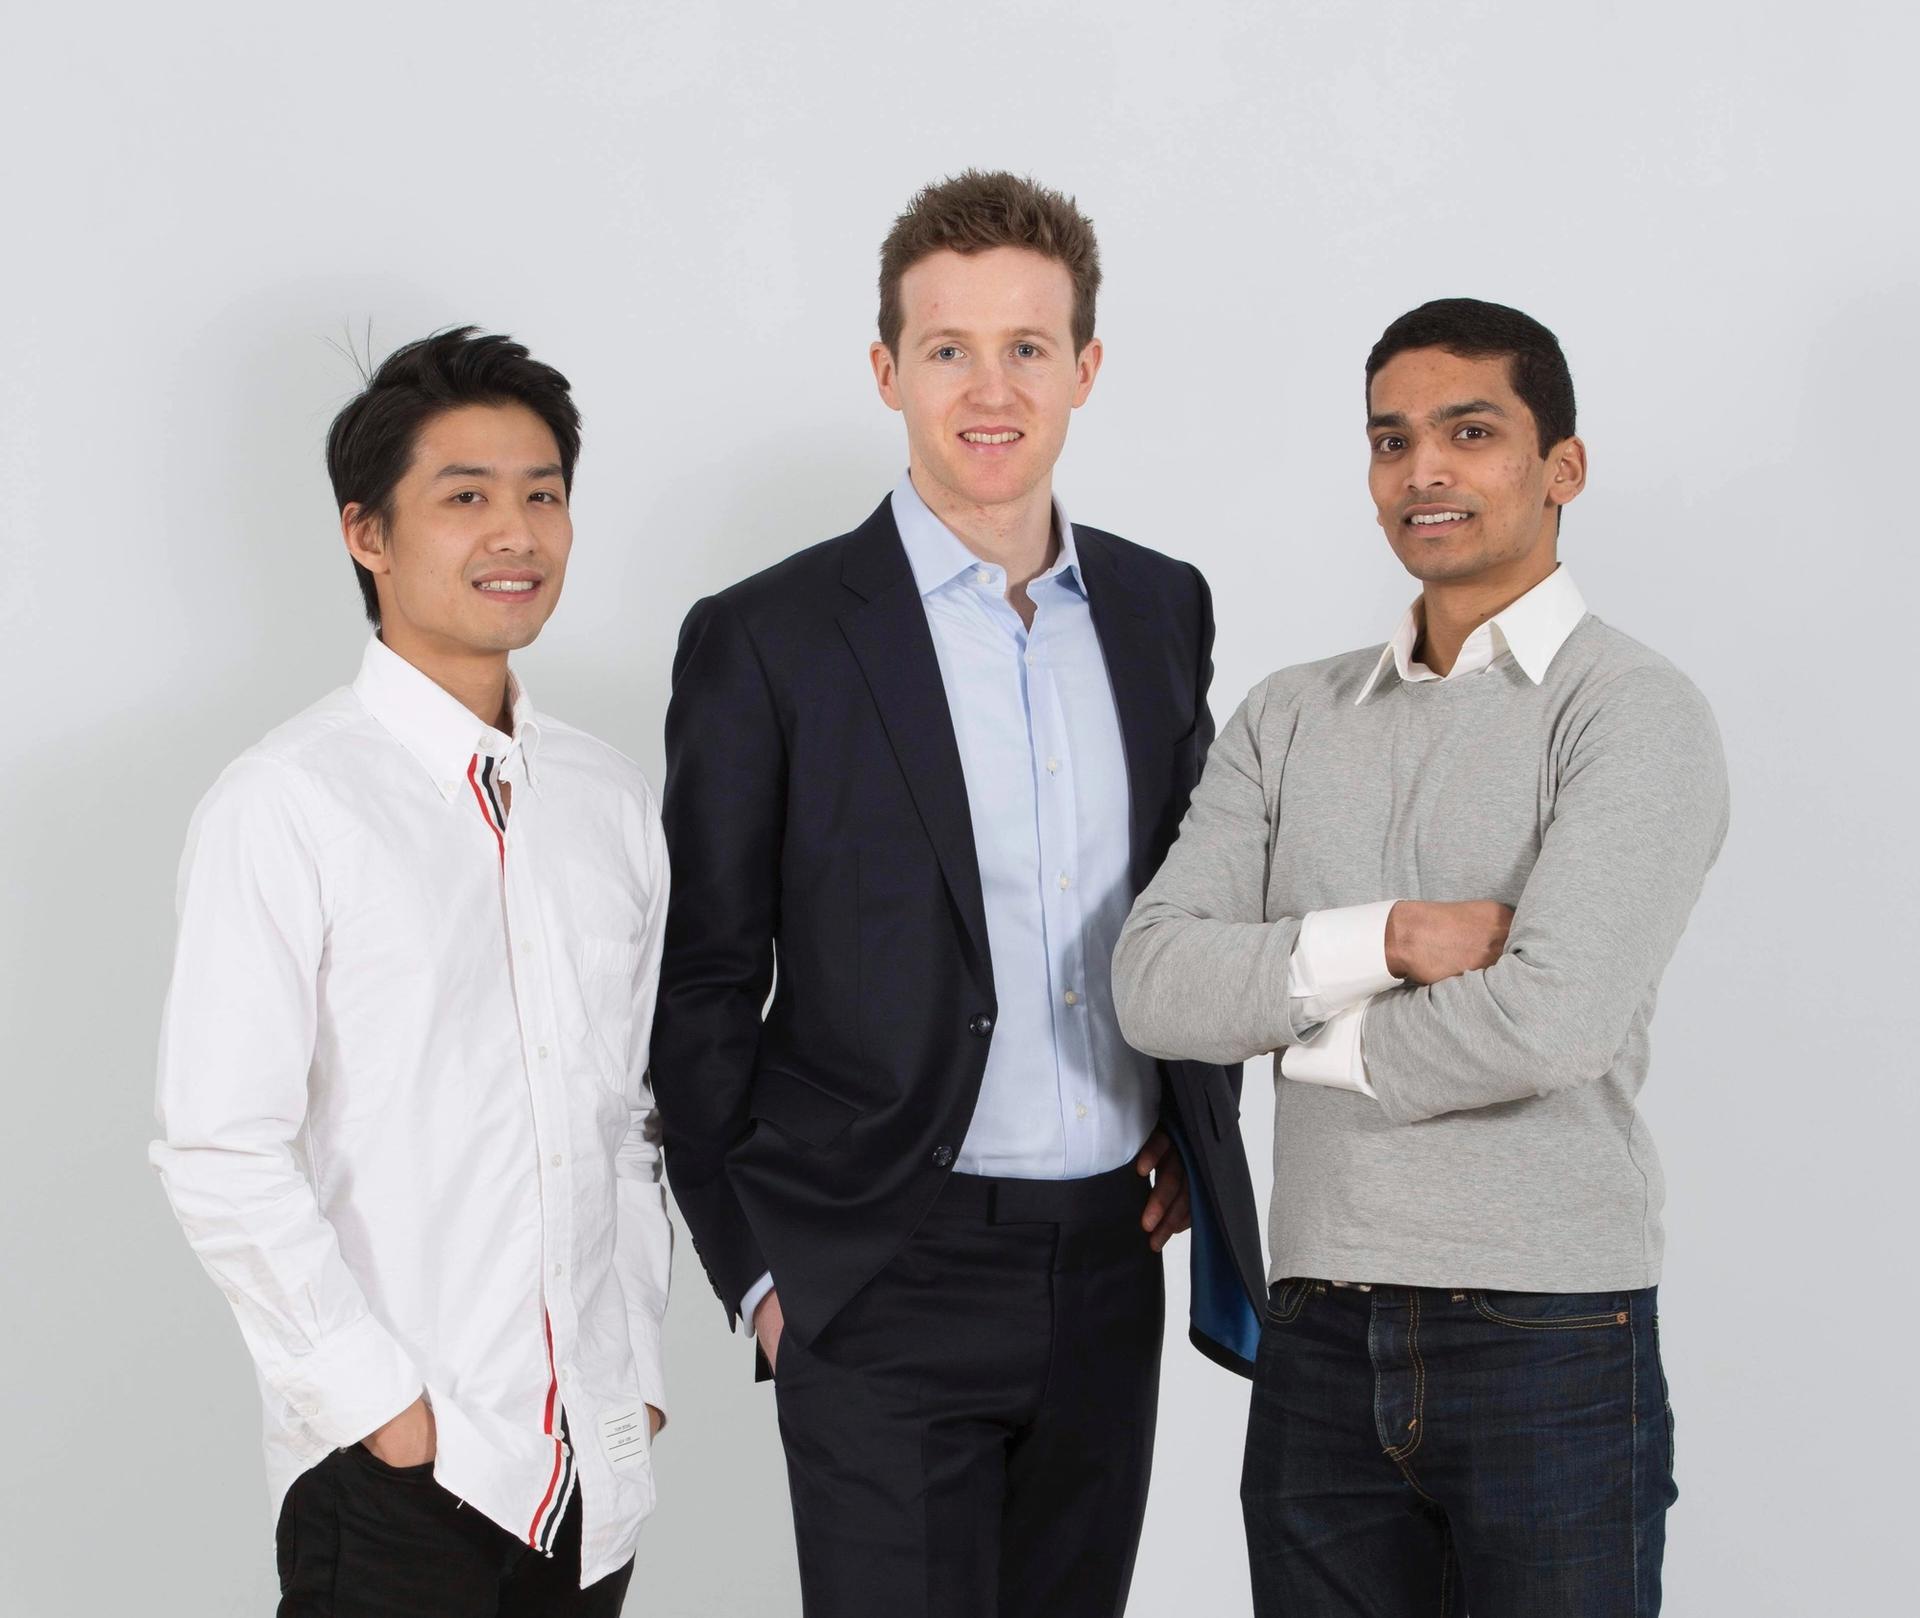 Andrew Shum, Richard Vibert and Ahmad Qamar Sotheby's